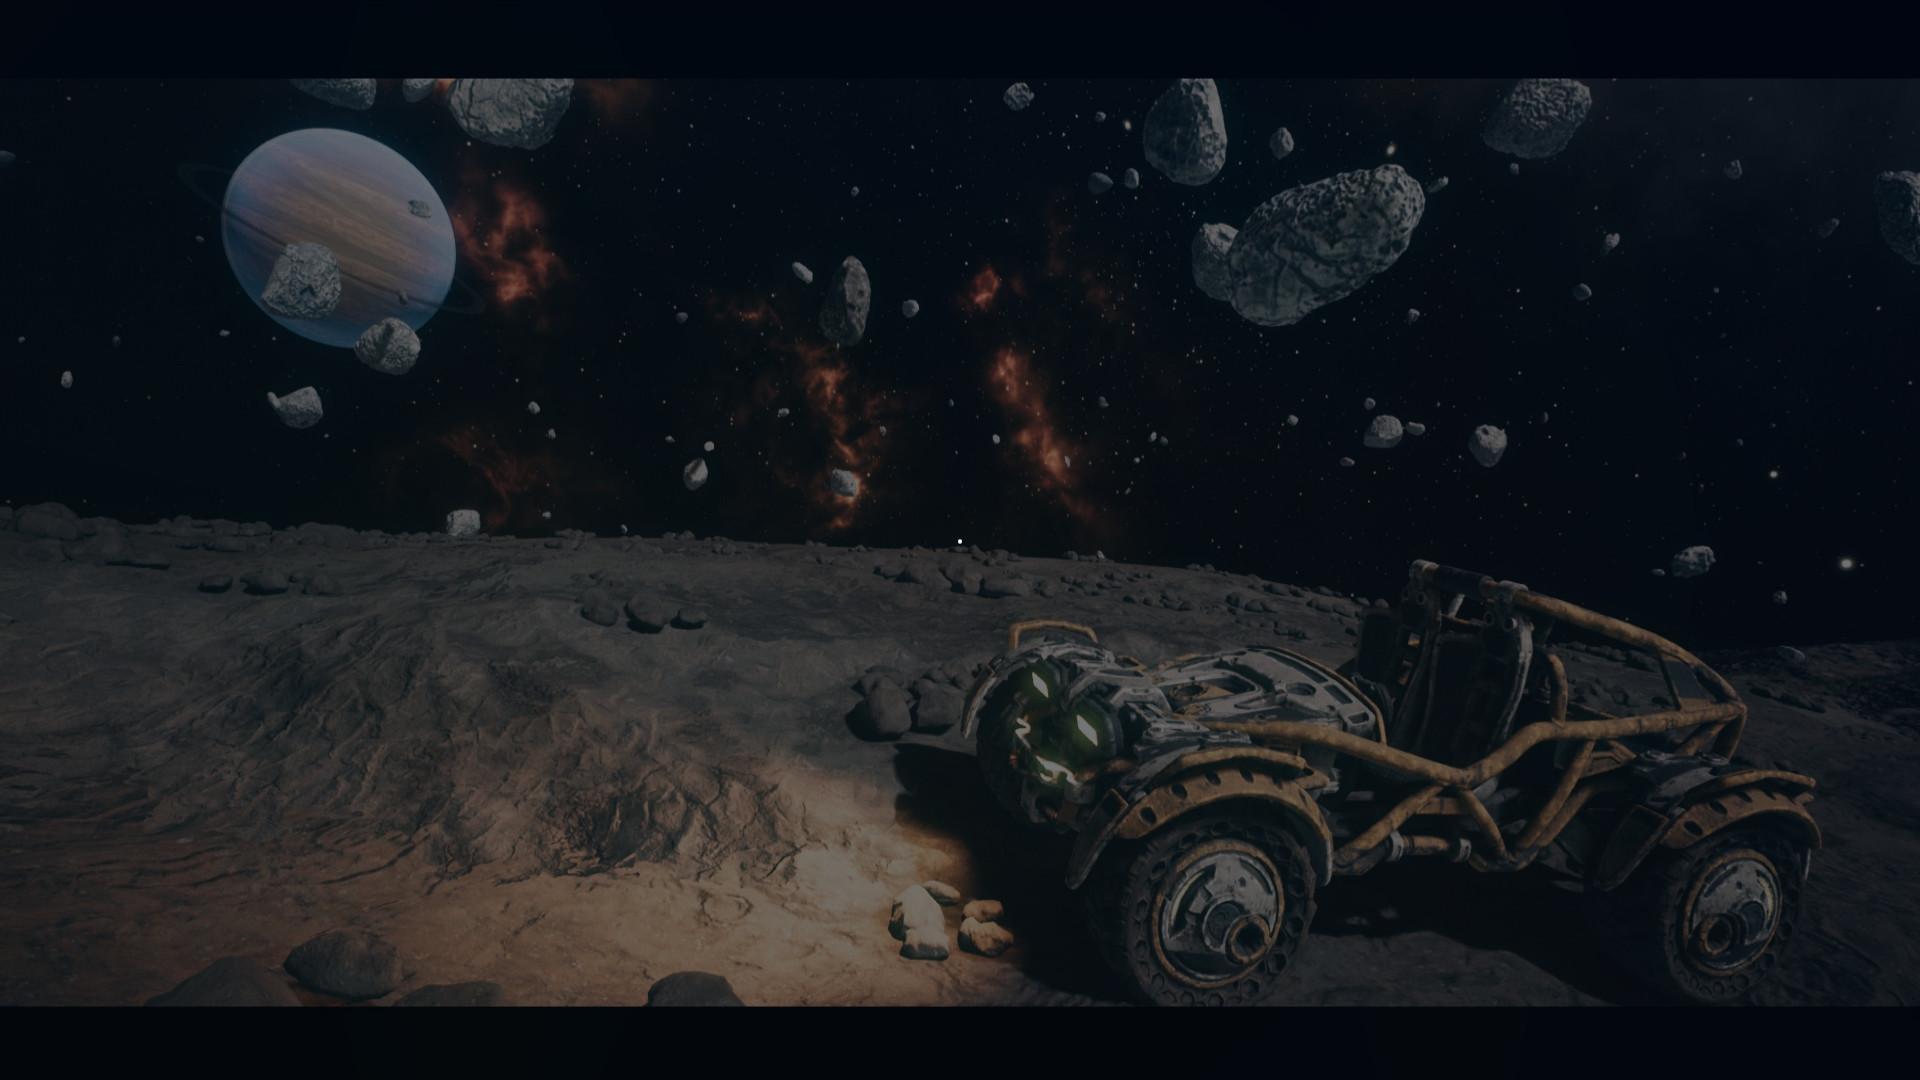 the-moon-relax-pc-screenshot-01